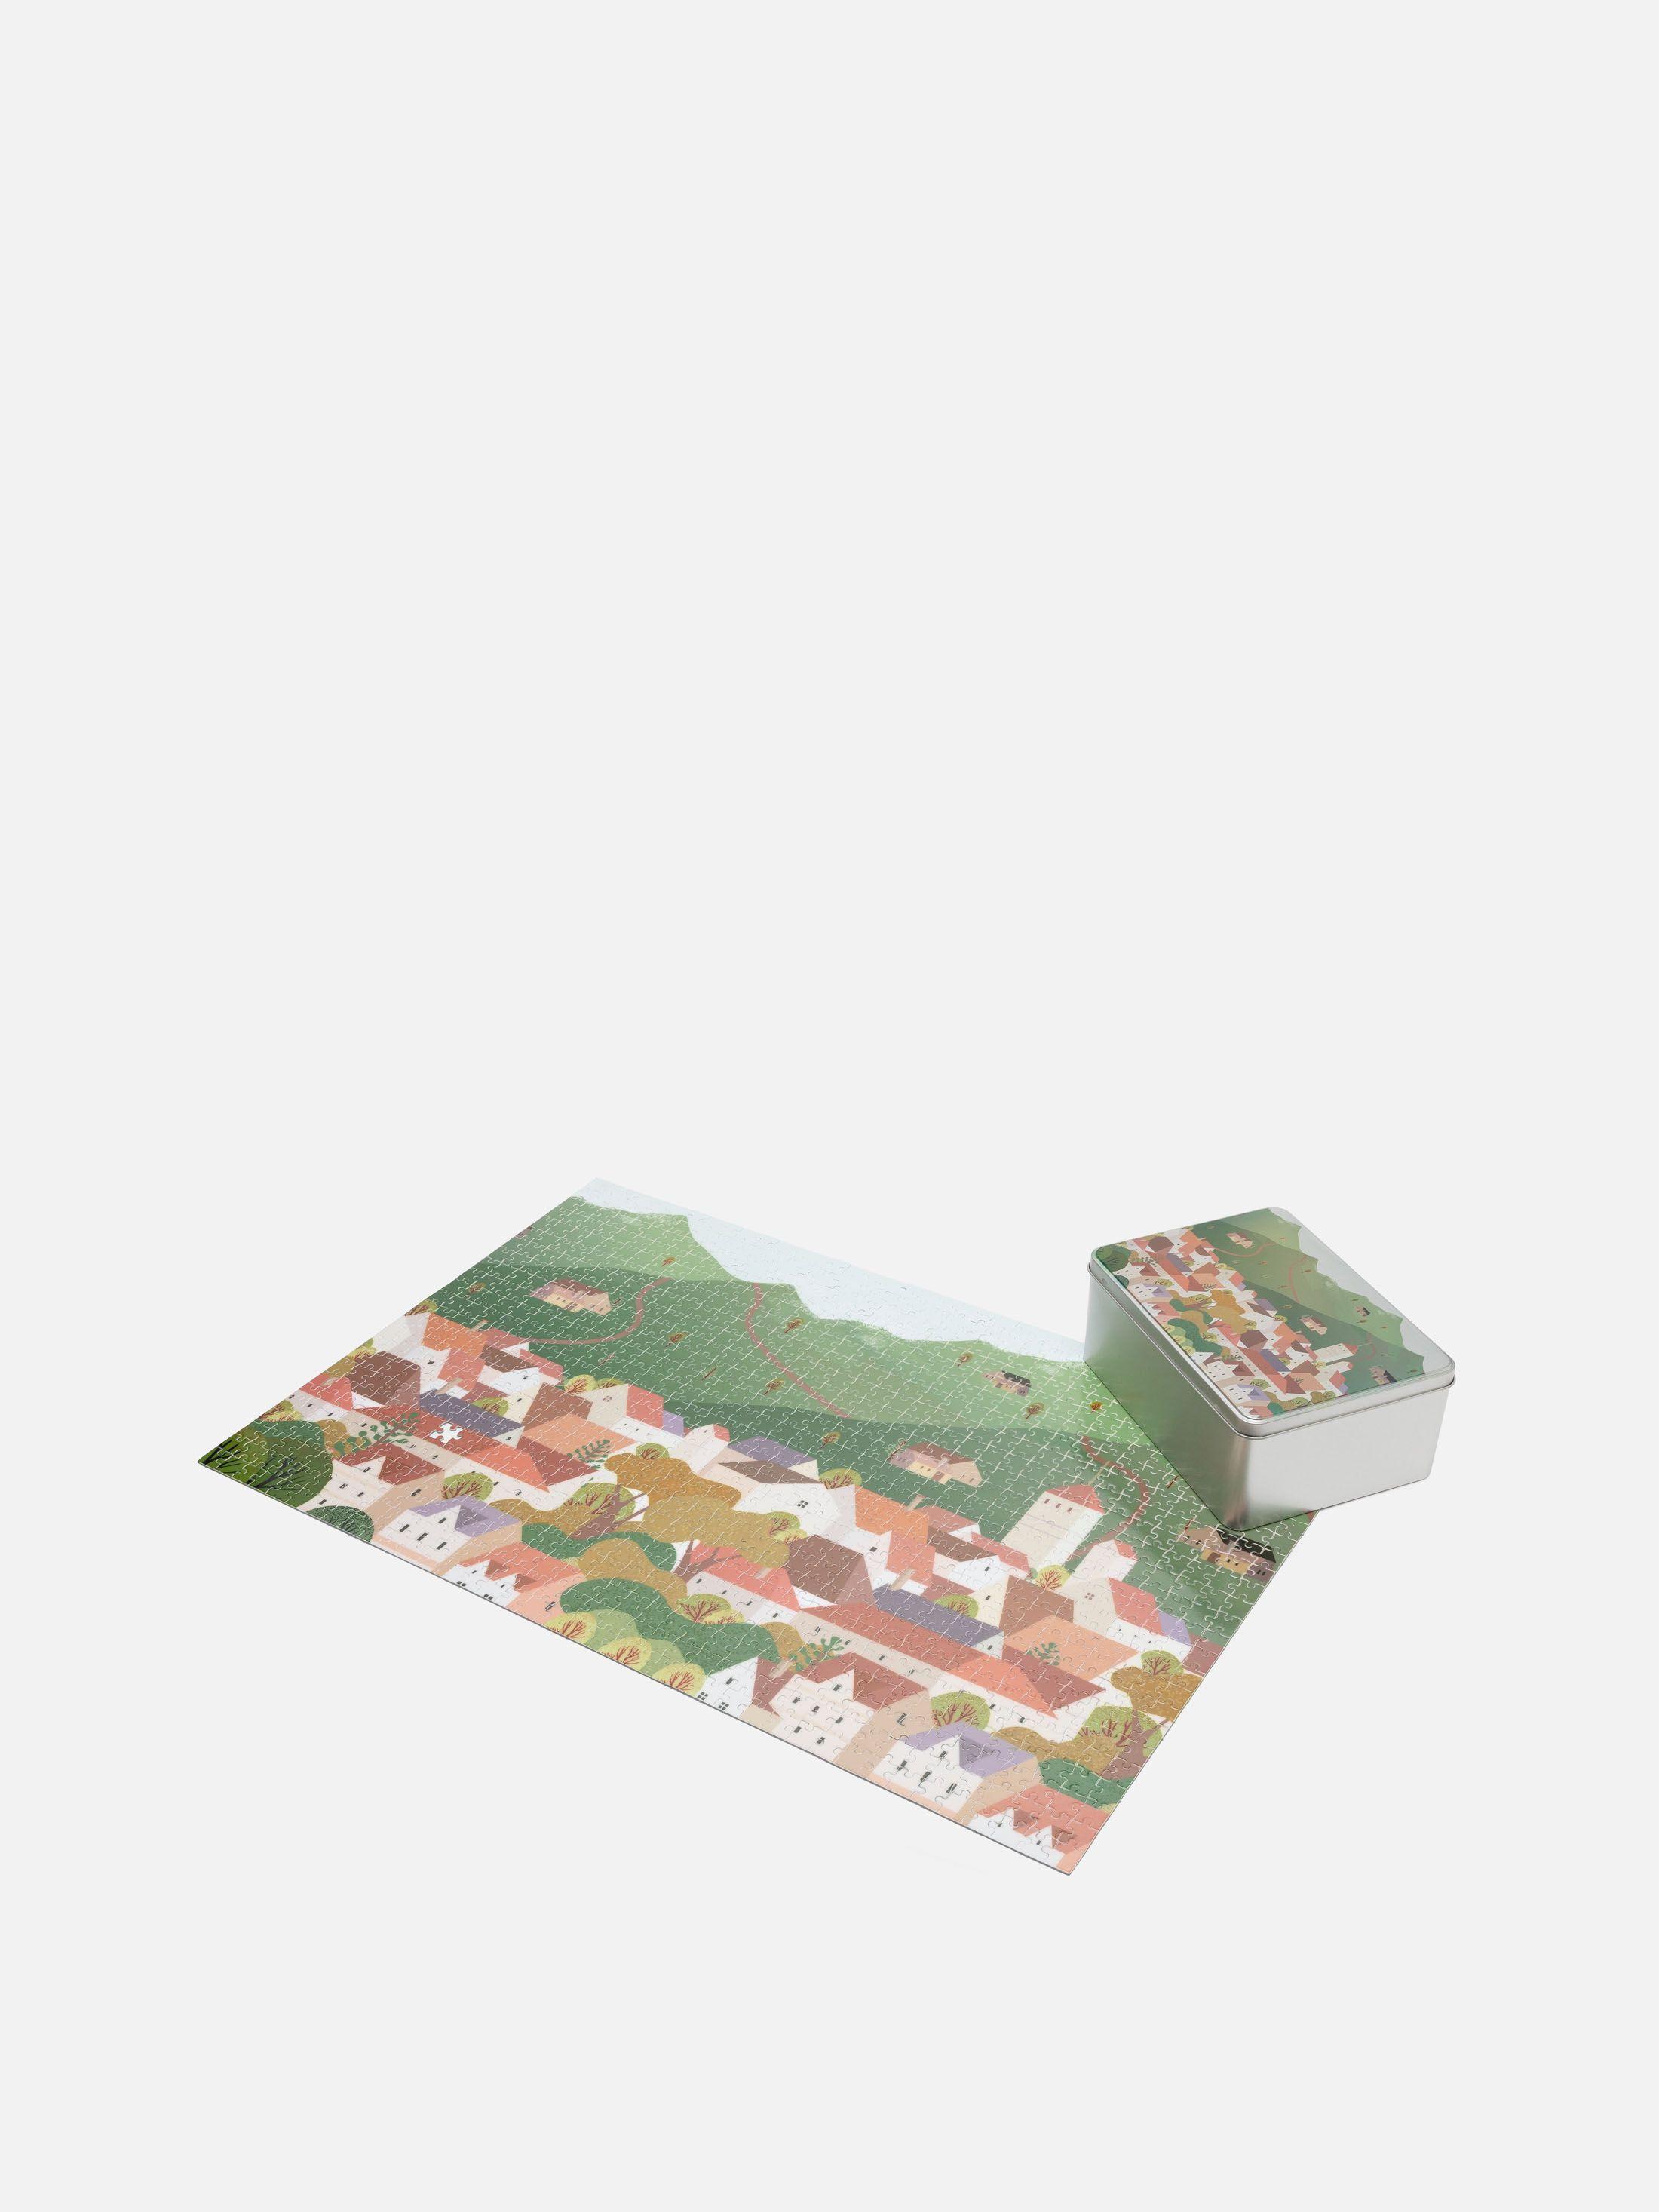 custom design jigsaw